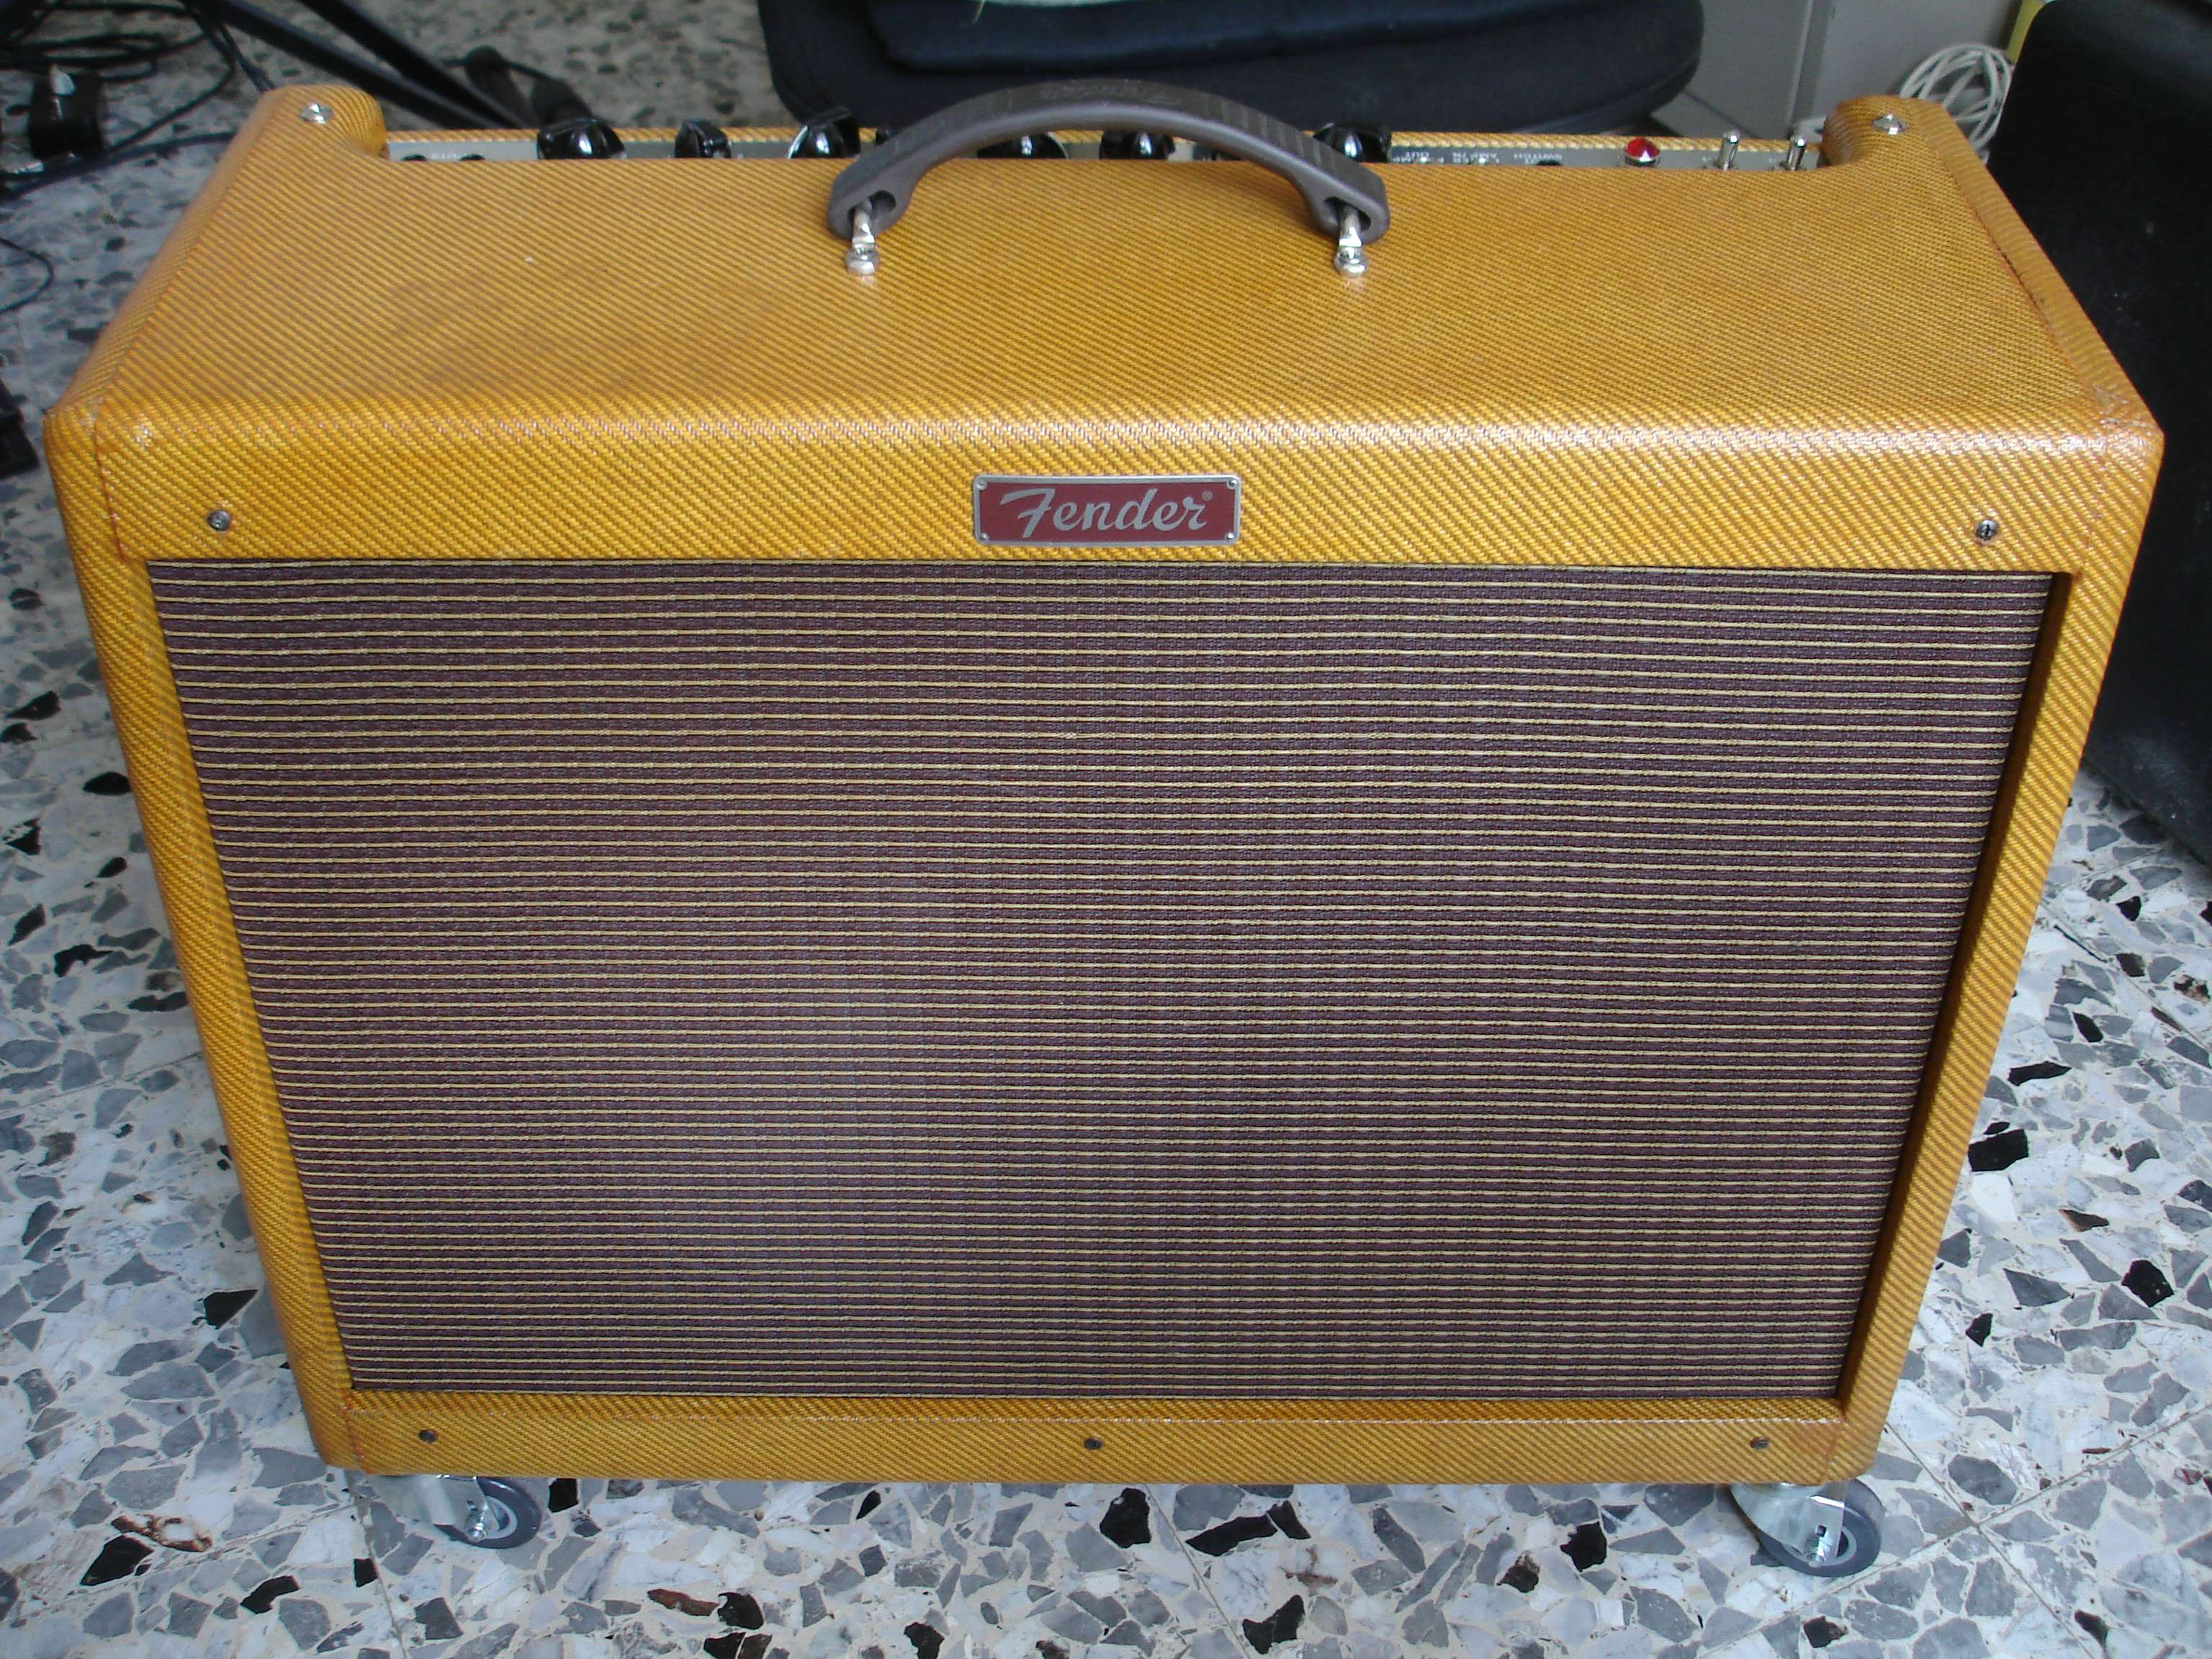 Fender Blues Deluxe Reissue Image 459856 Audiofanzine border=